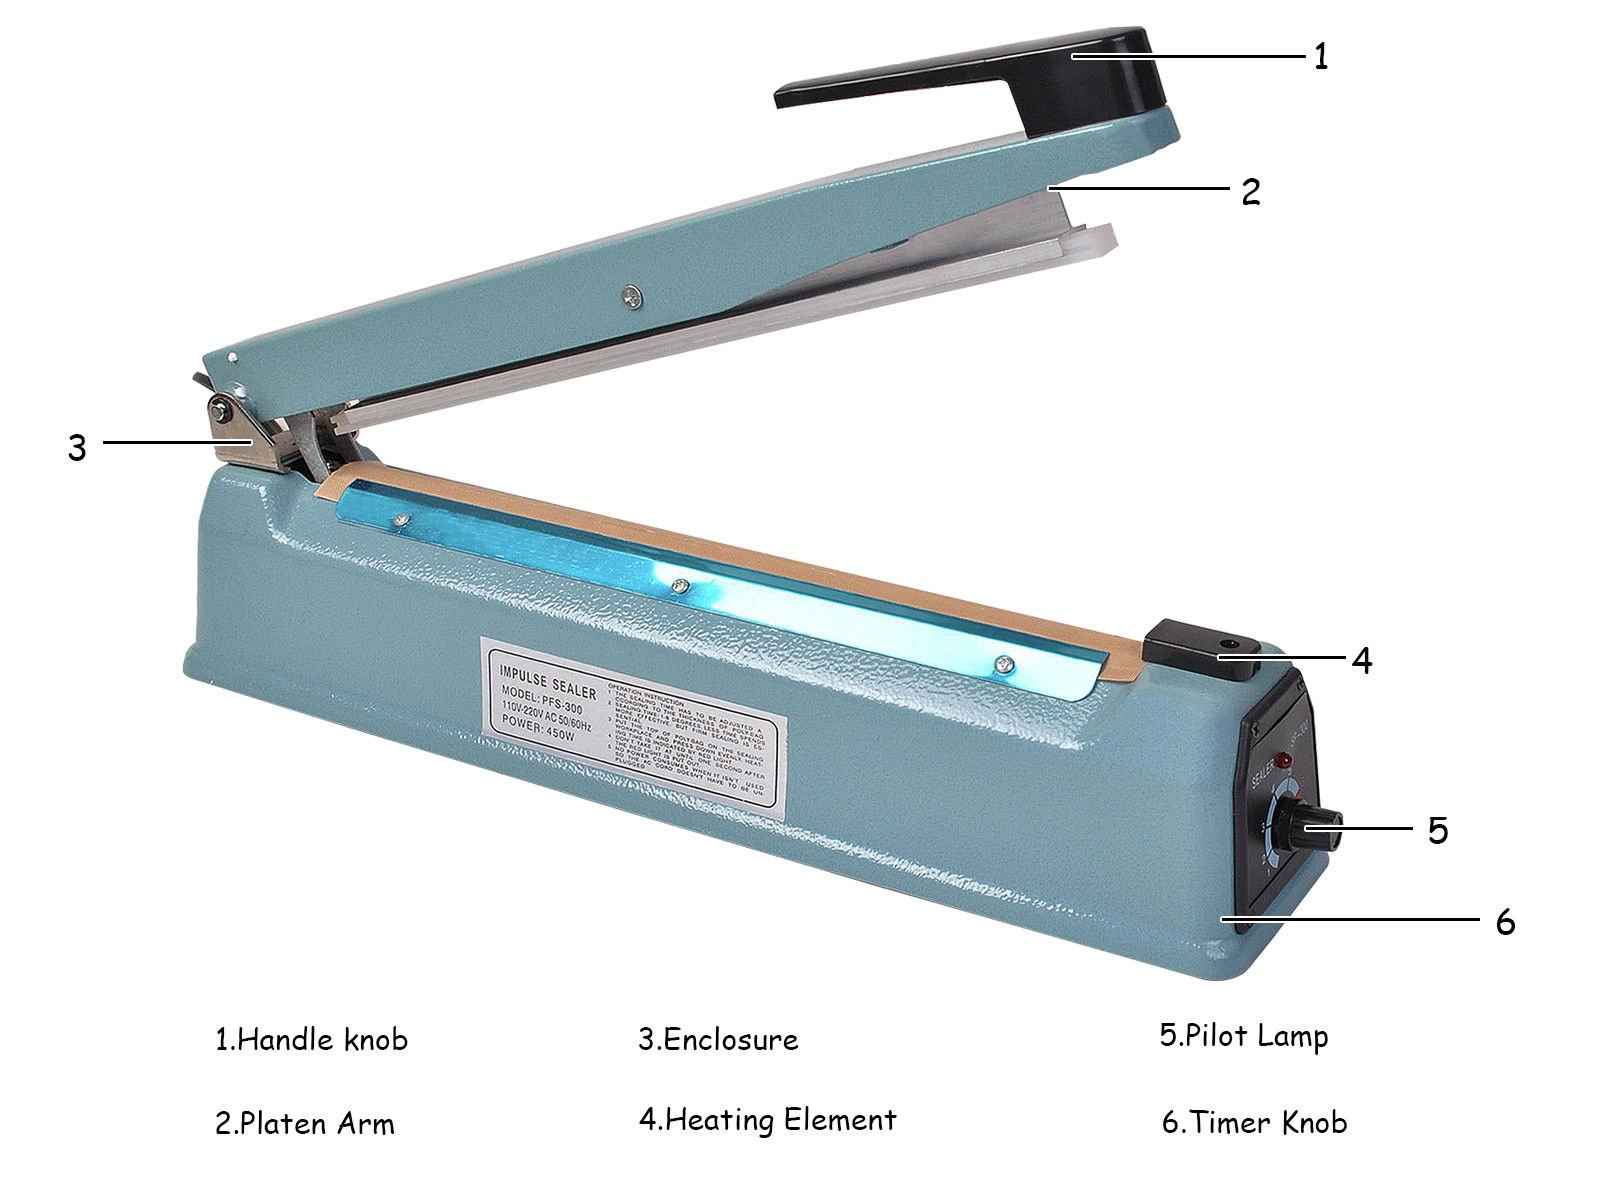 Super buy 12'' Heat Sealing Hand Impulse Sealer Machine Poly Free Element Grip& Teflon by Goplus (Image #5)